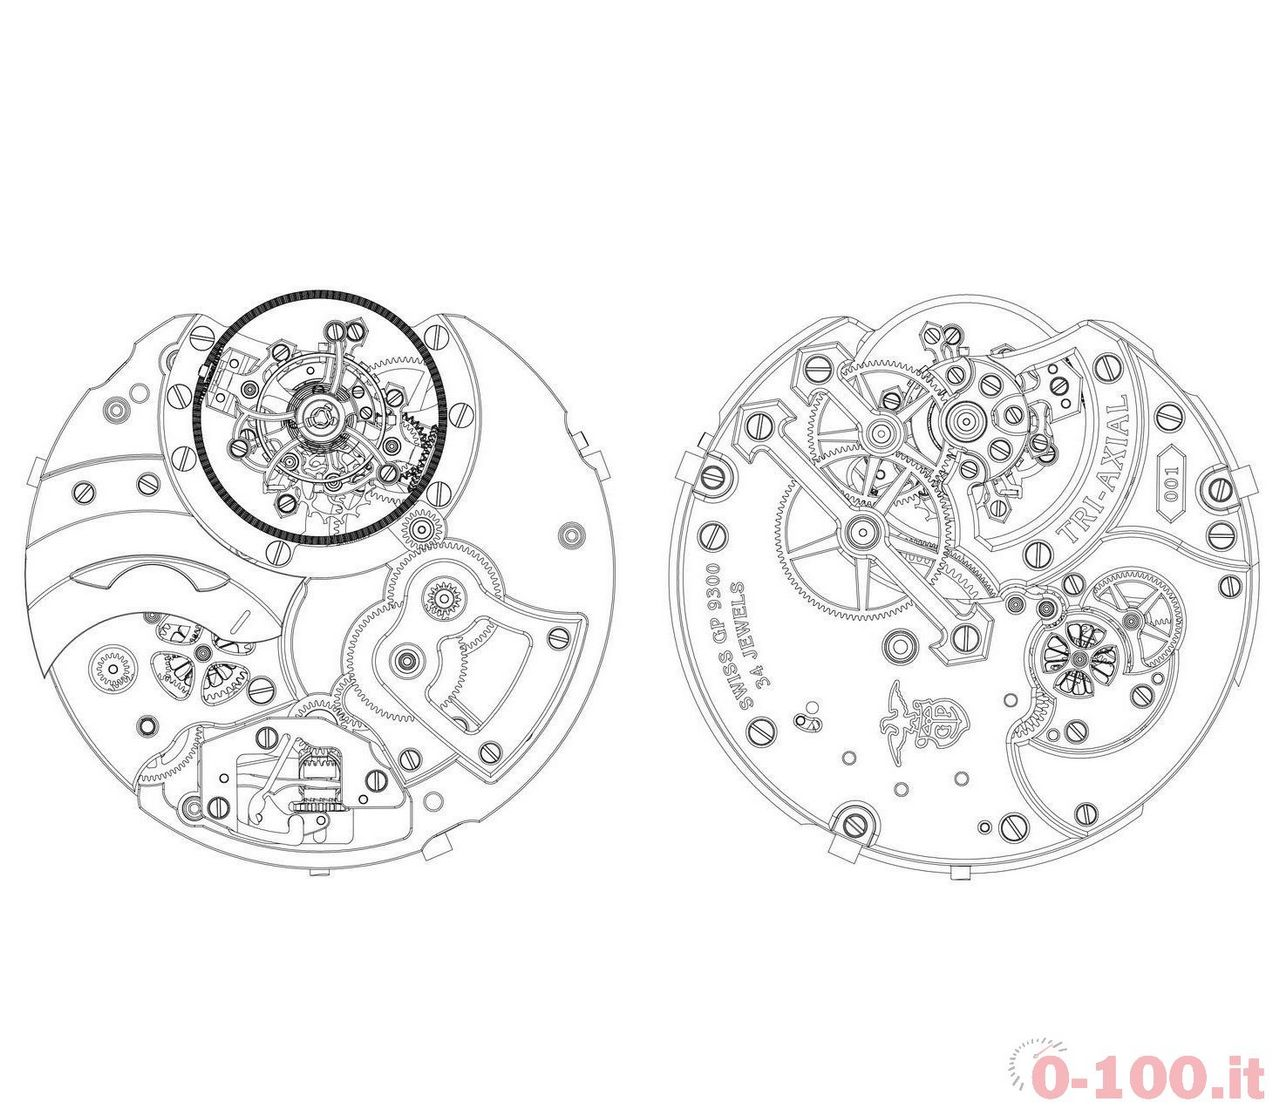 00-000-5410-GP-01A-1 - Feuille1